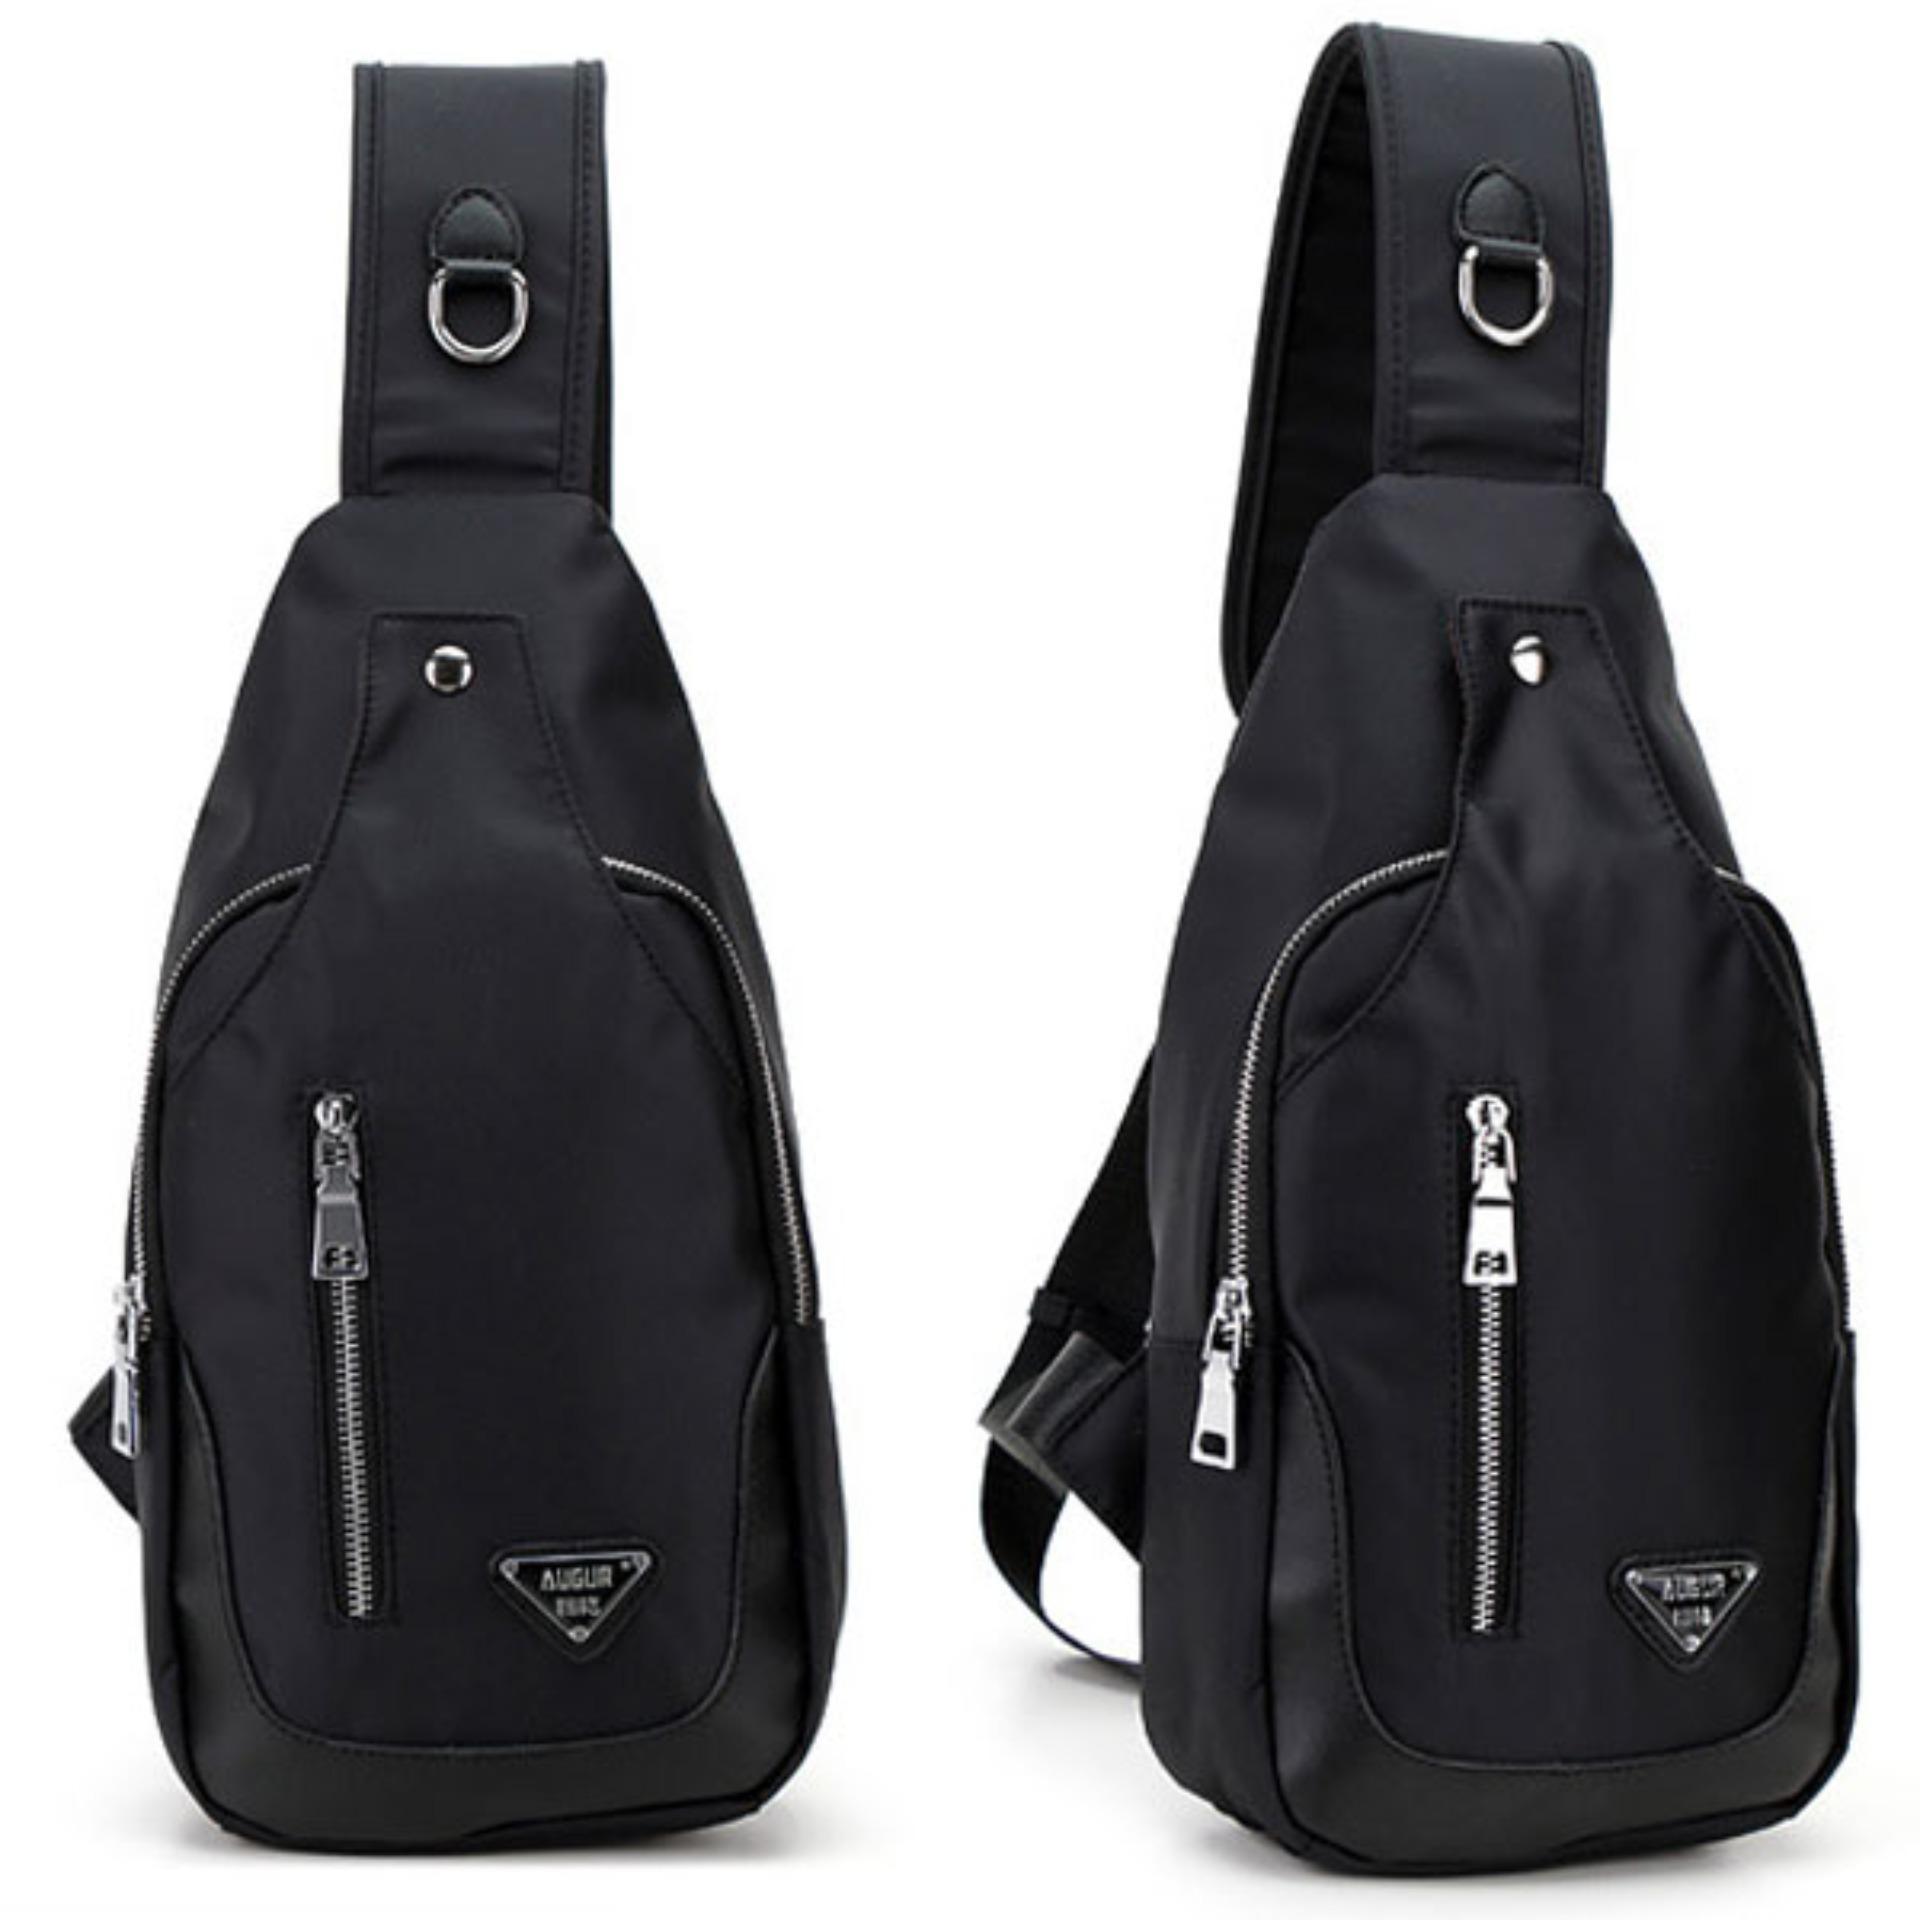 Spesifikasi Augur Men S Gloss Velcro Shoulder One Strap Bag Tas Bahu Tsj338 Black Tas Pria Murah